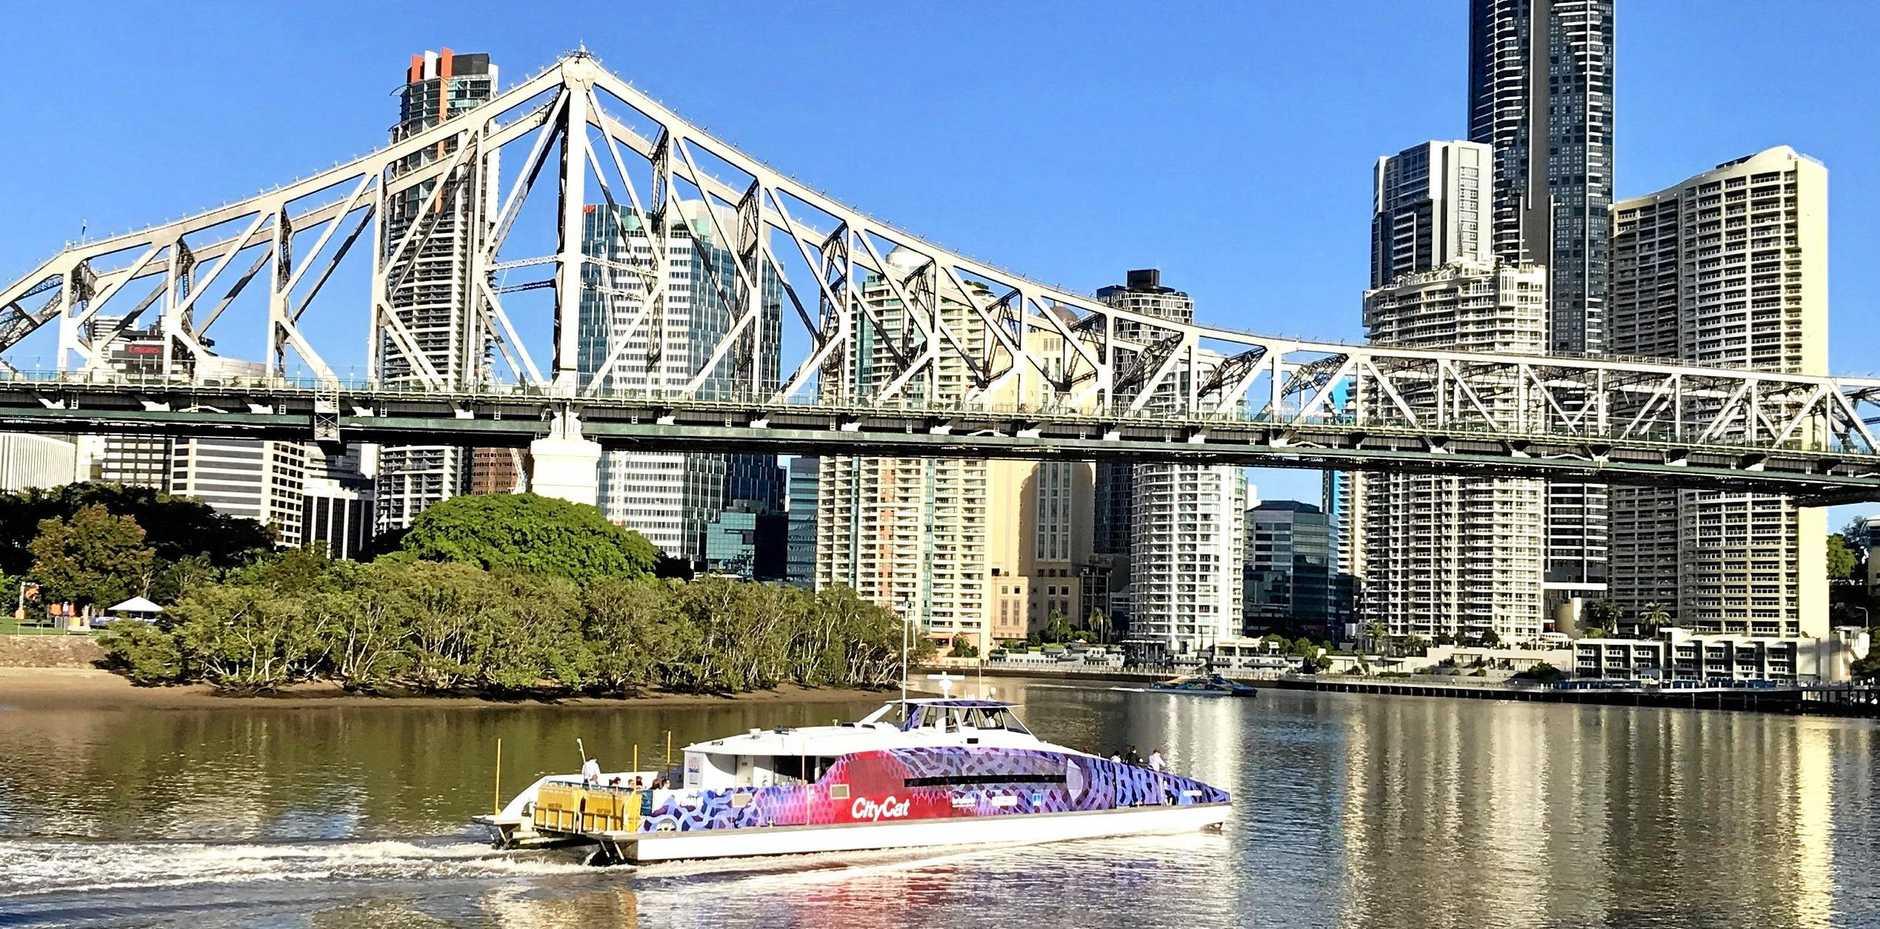 A CityCat cruises towards Brisbane's Story Bridge.